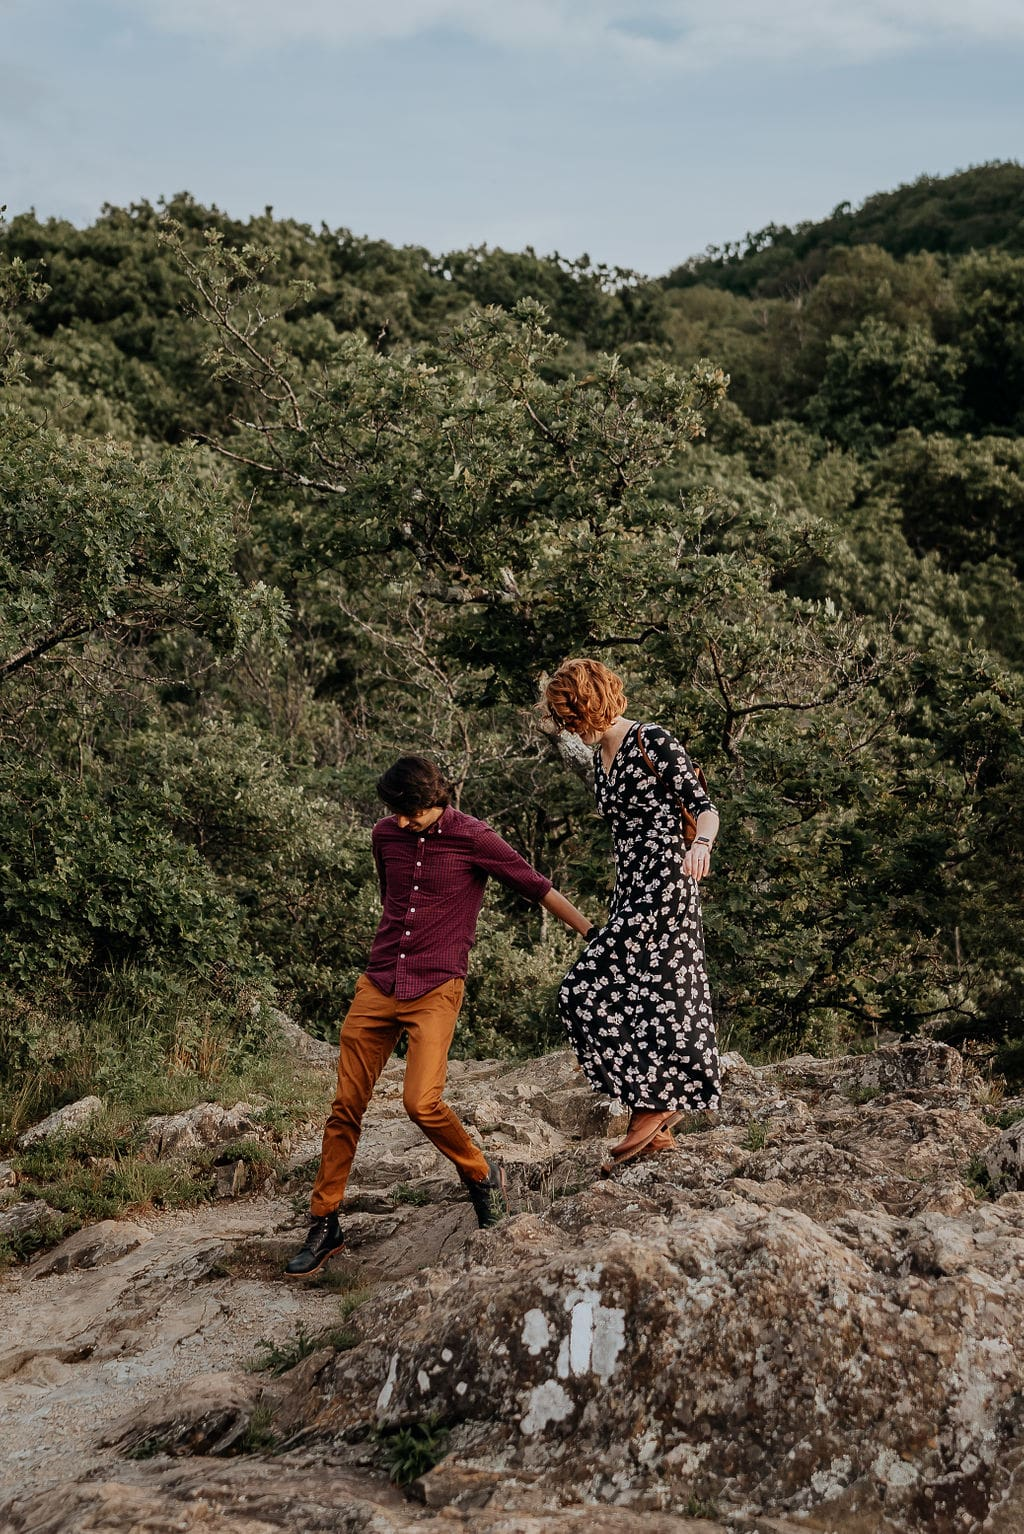 Jess-and-Amir_Shenandoah-AdventureSession-Flit-Photography-8-min